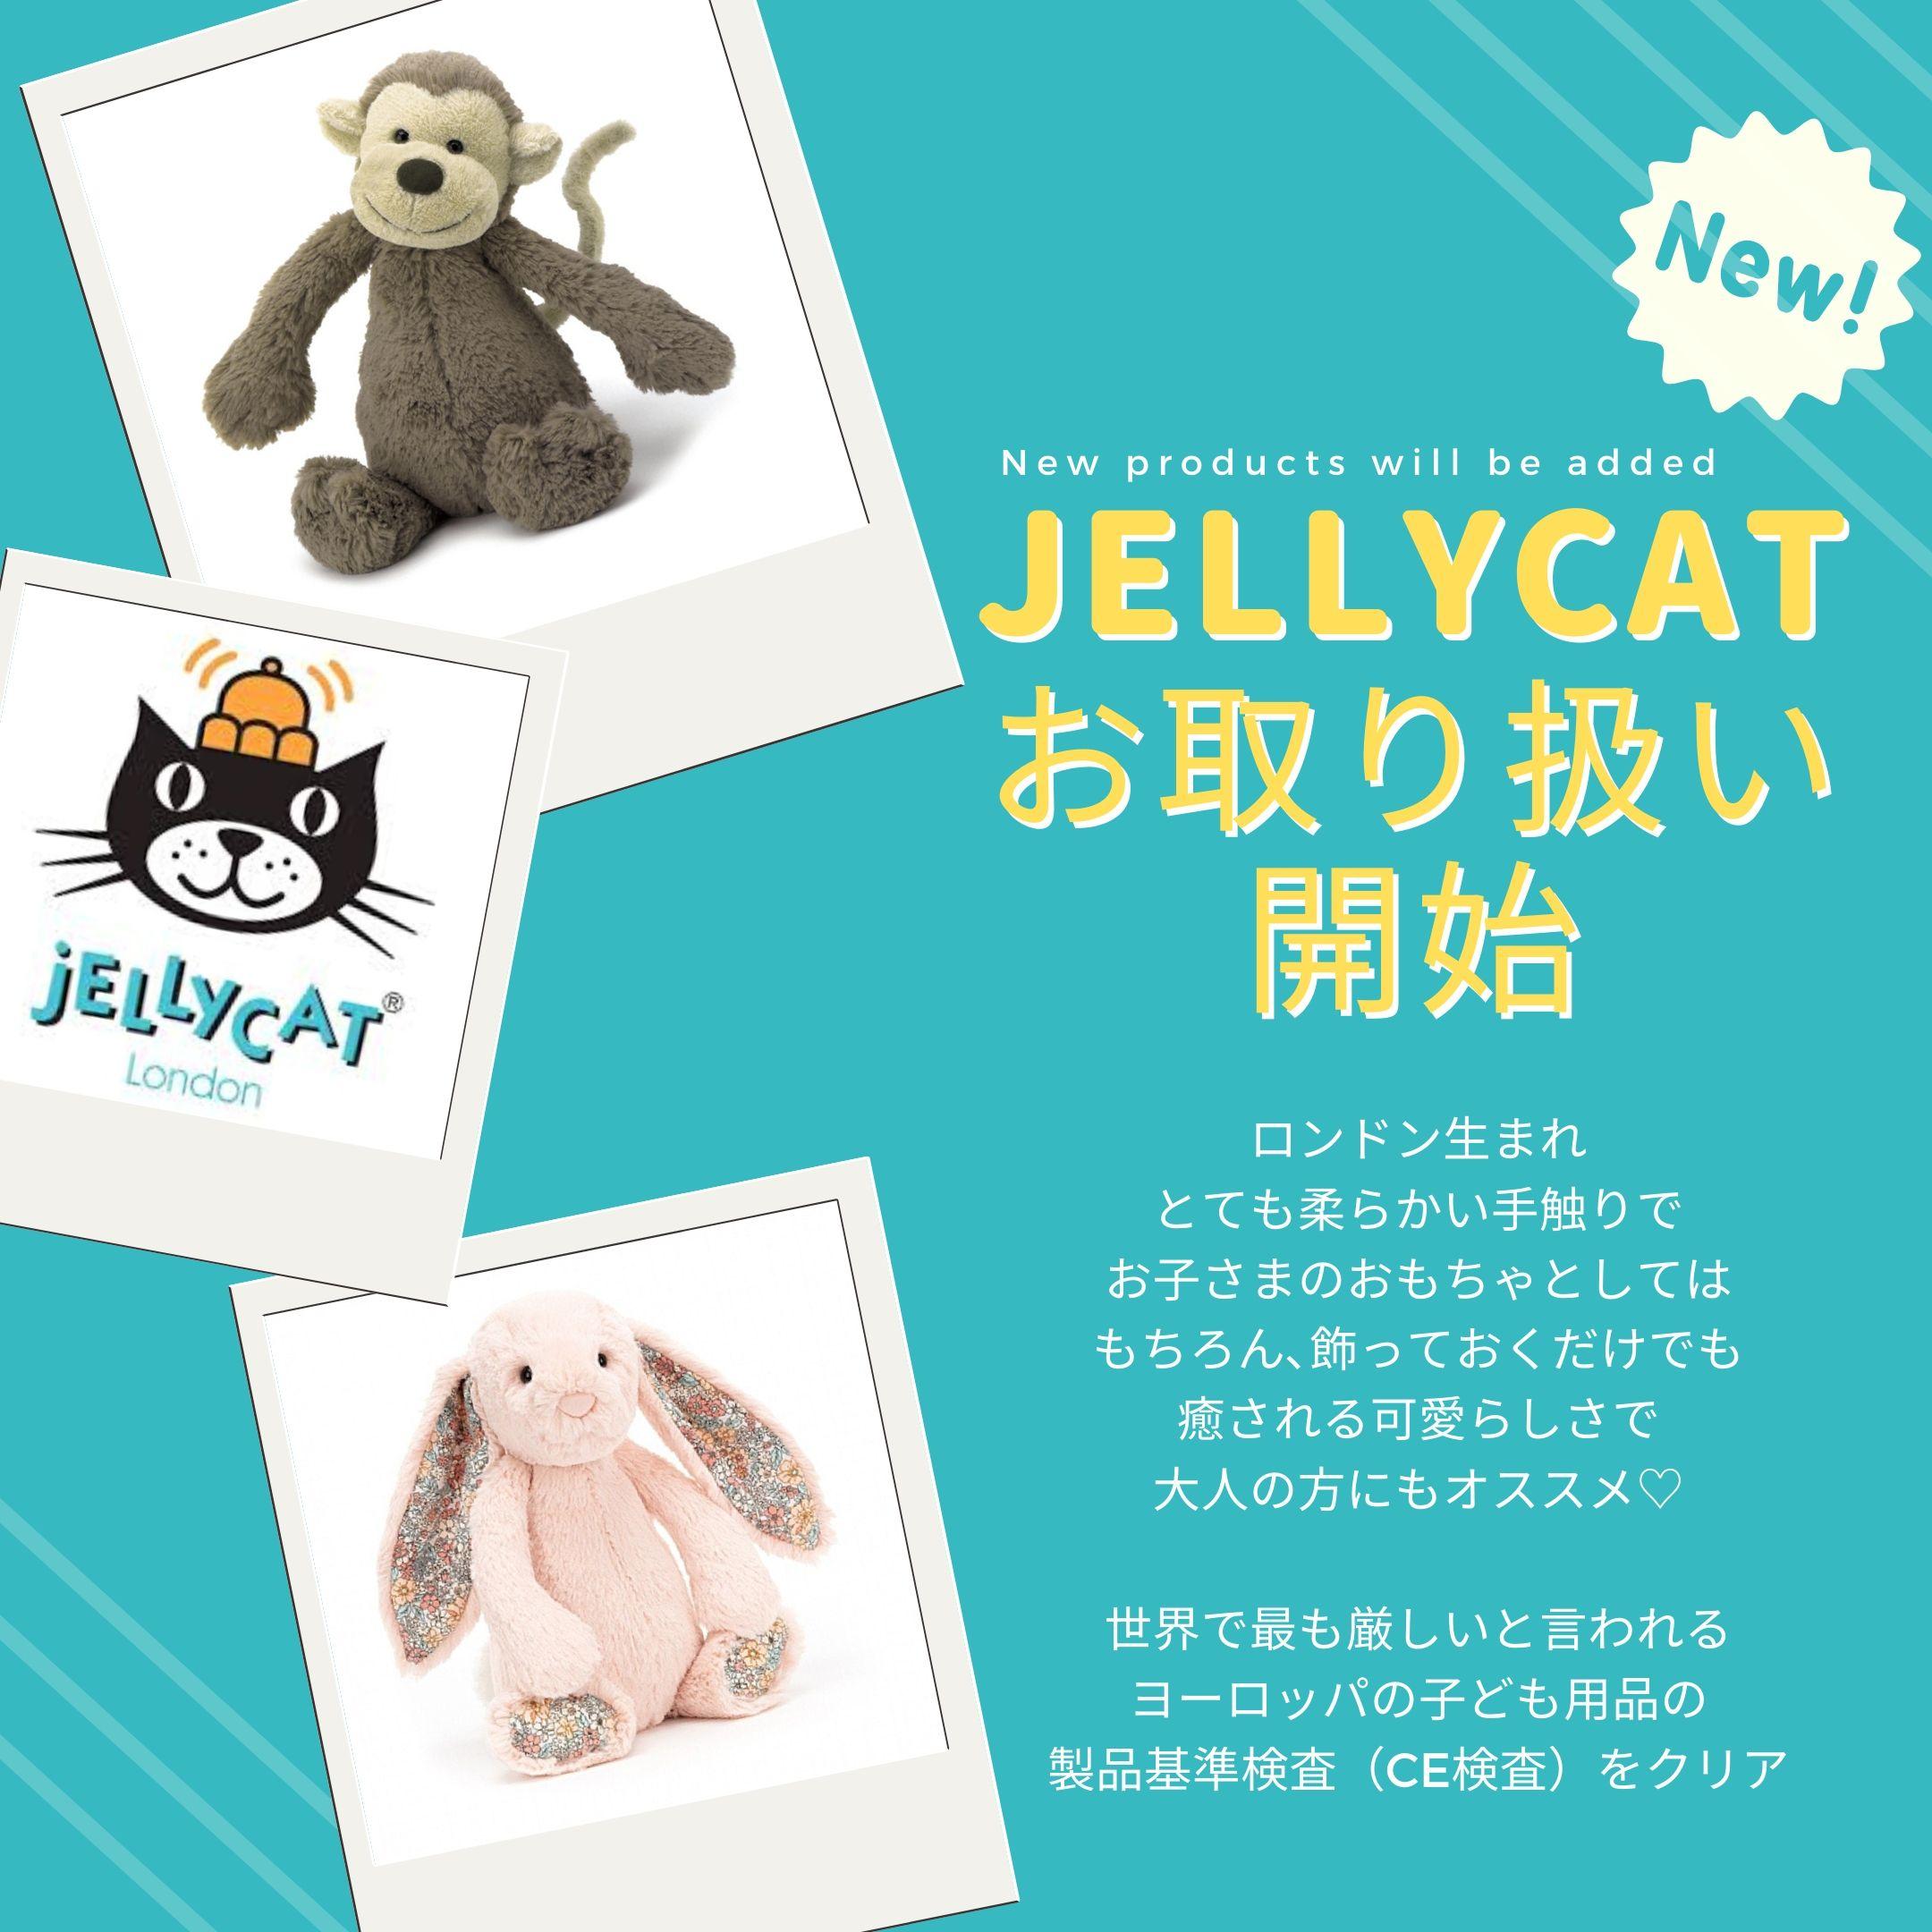 JELLYCAT〈ジェリーキャット〉さんと お取引できるようになりました